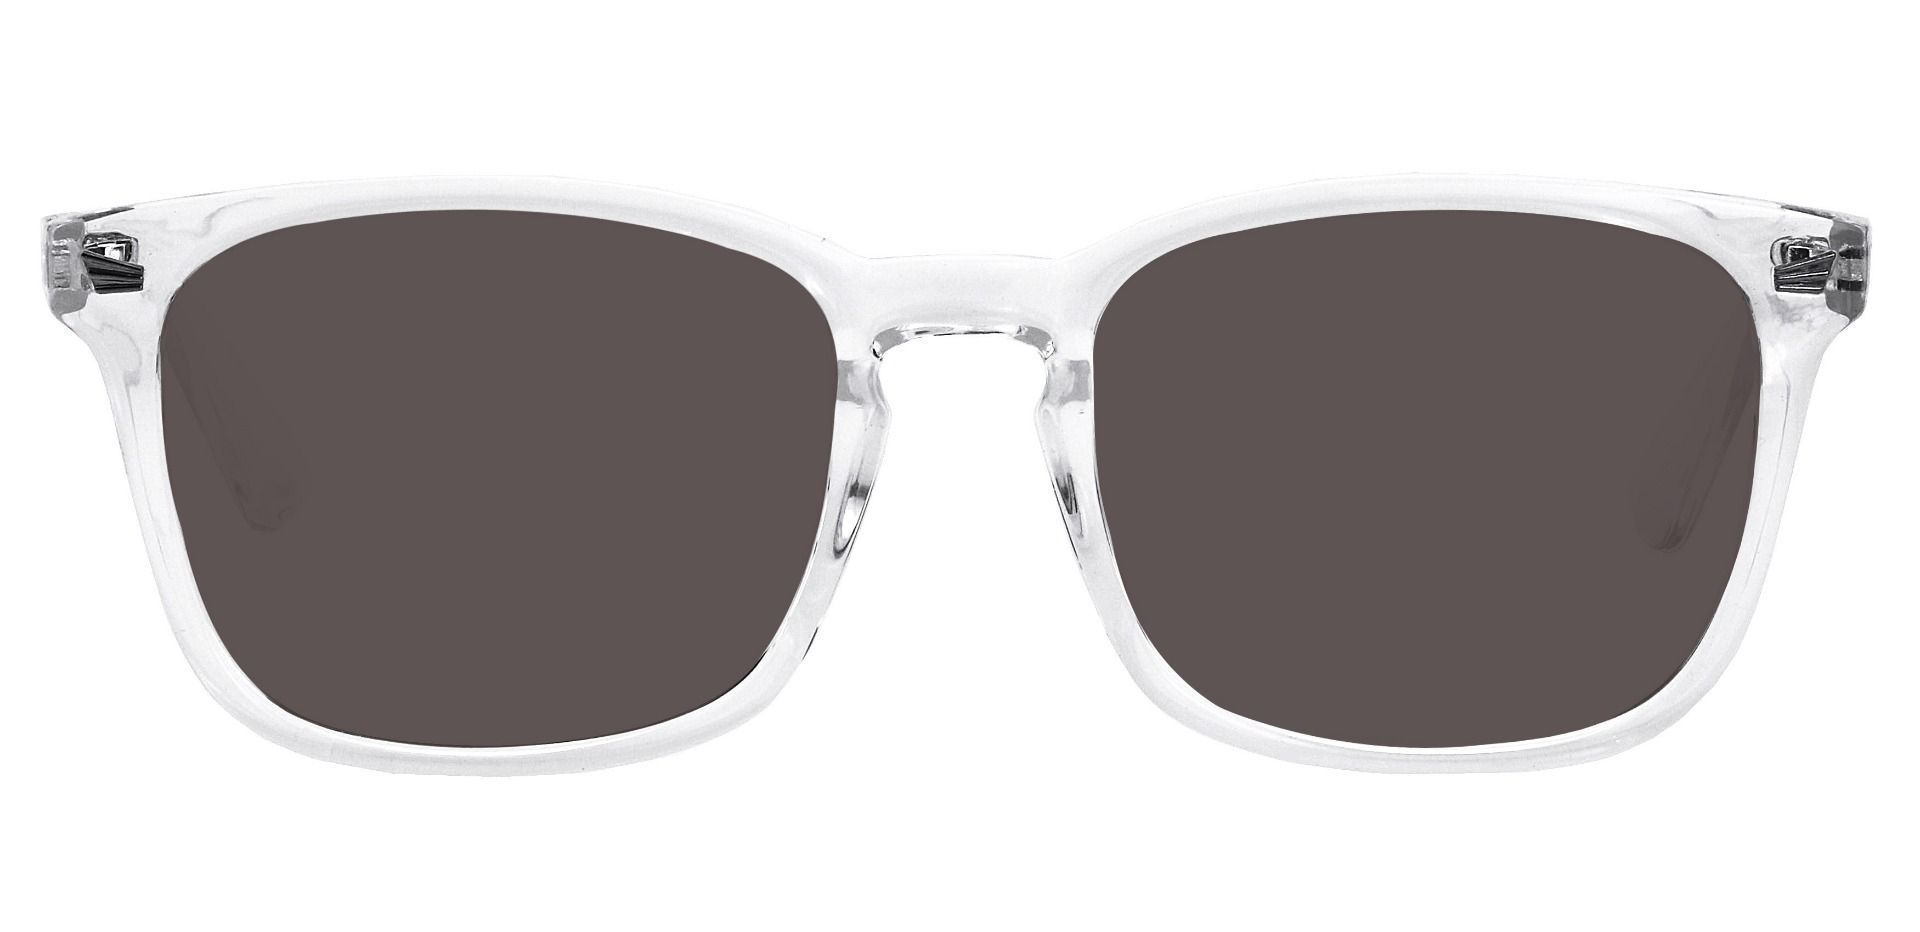 Rogan Square Progressive Sunglasses - Clear Frame With Gray Lenses